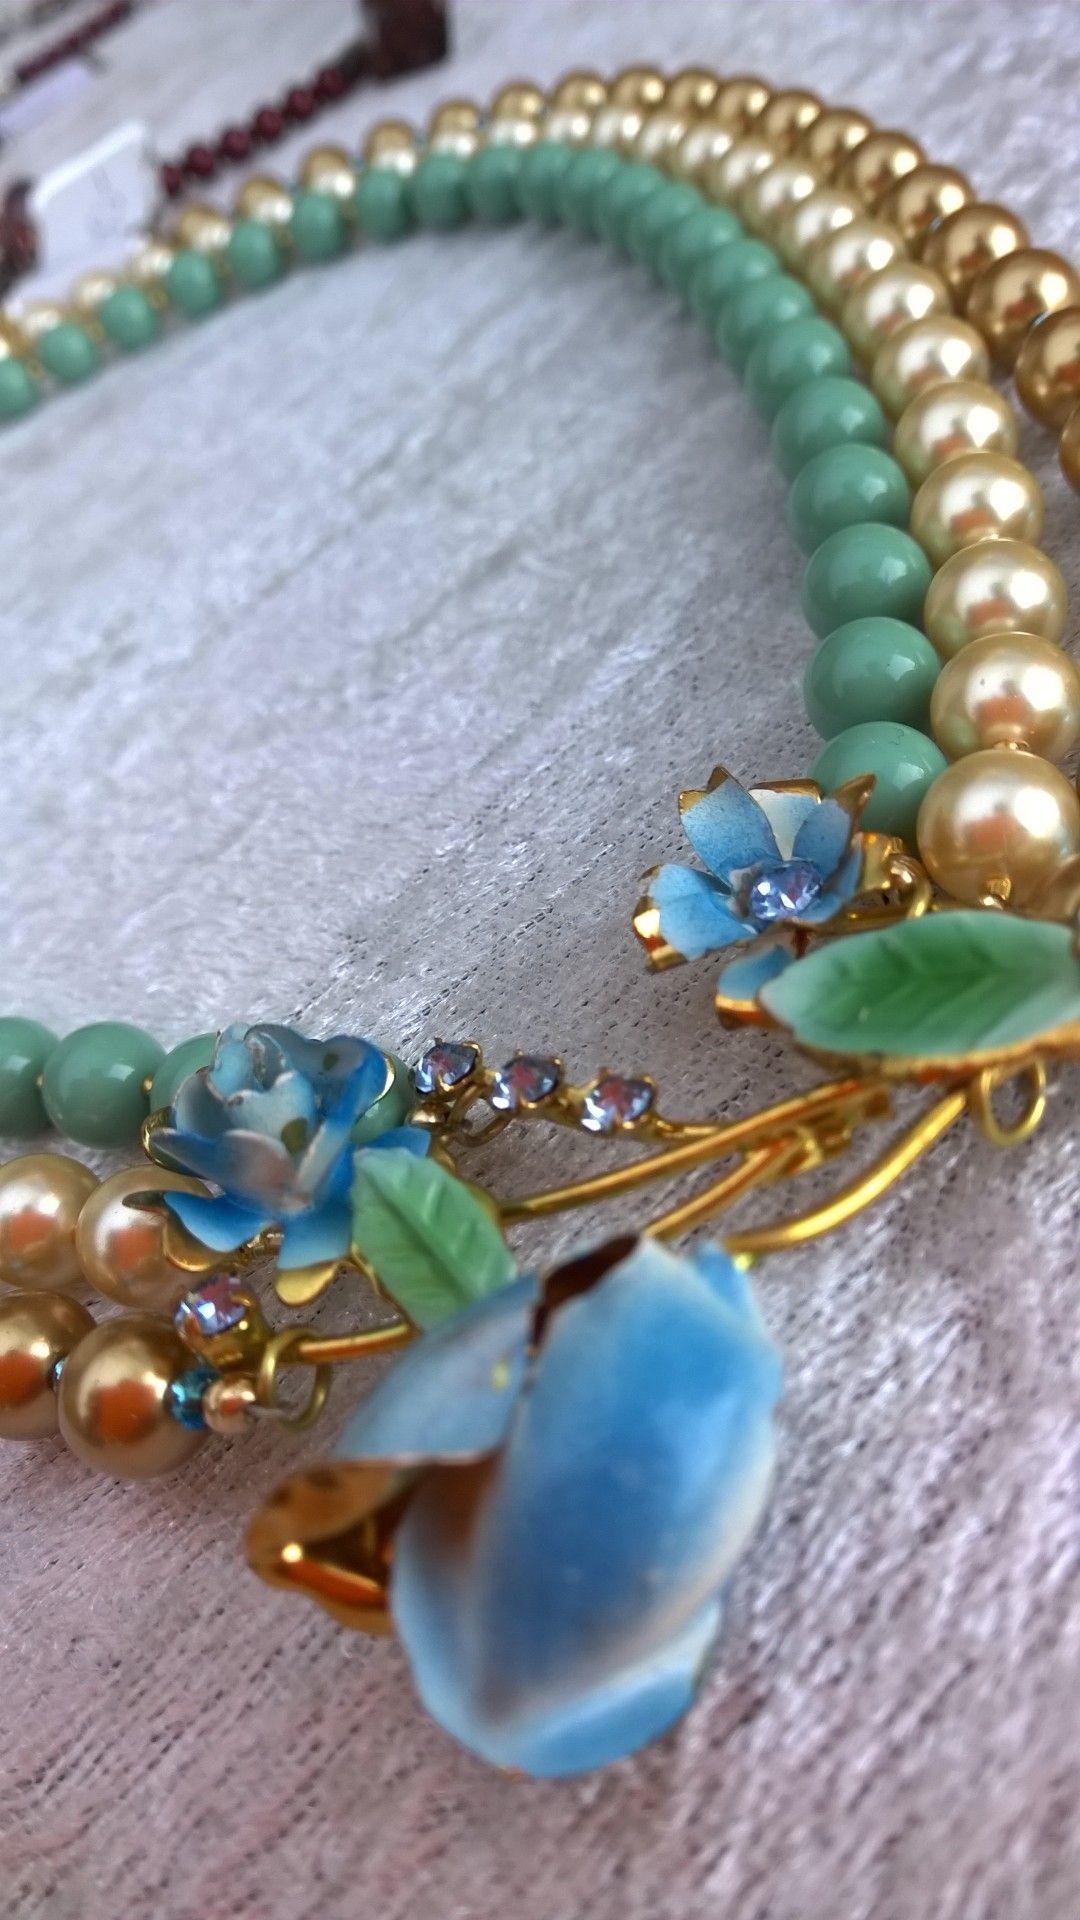 1950 vintage brooch, Swarovski crystal pearls.